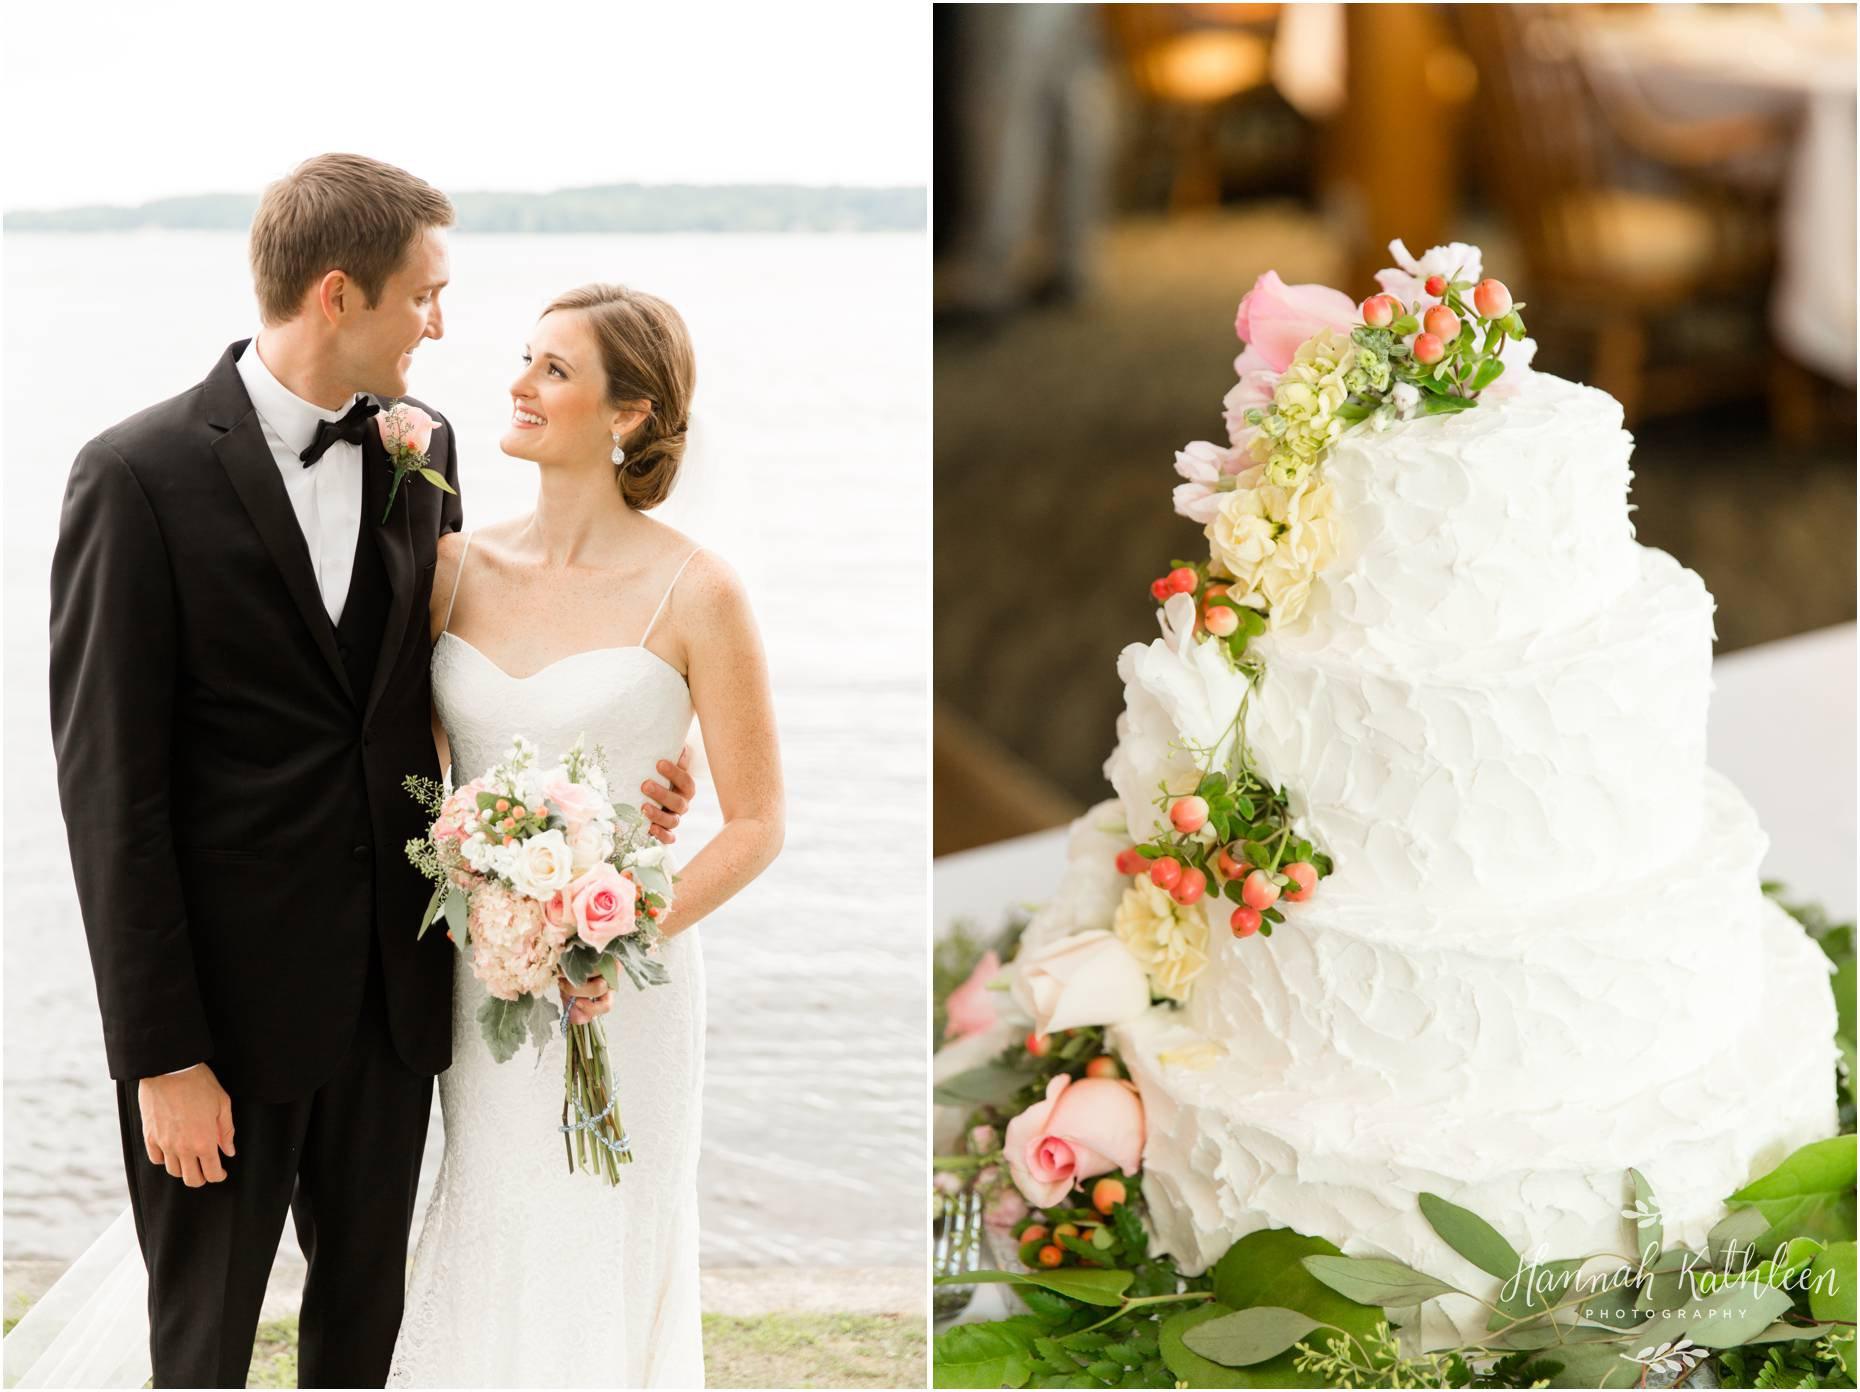 Buffalo_New_York_Wedding_Photographer_Disney_Fairytale_Photography_Alex_Klaire